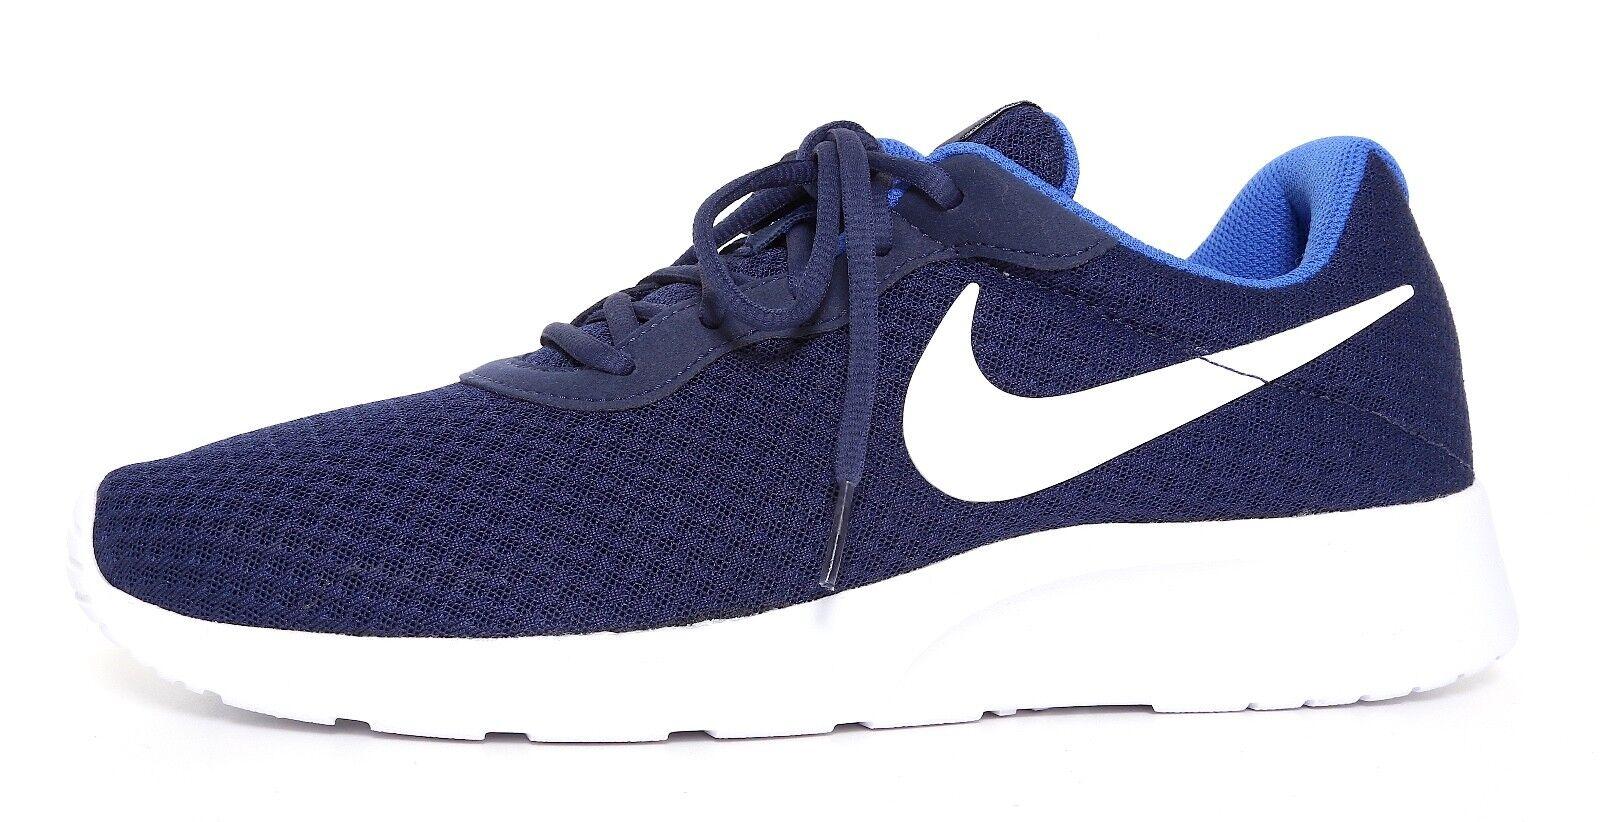 Nike tanjun scarpe blu navy uomini sz 11 6607 mezzanotte